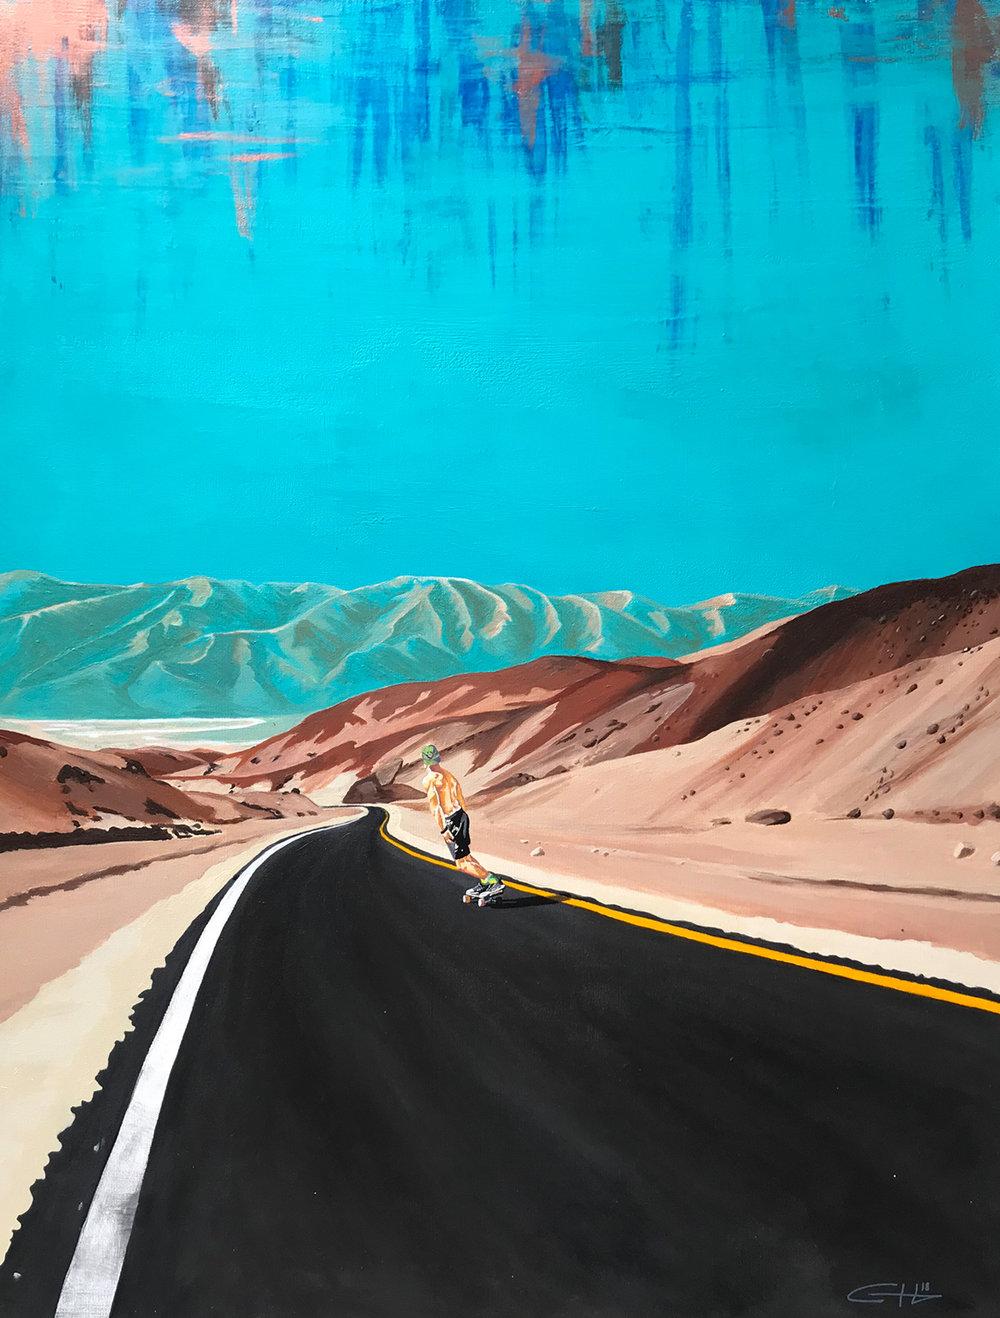 Death-Valley-Skateboarder-painting copy.jpg